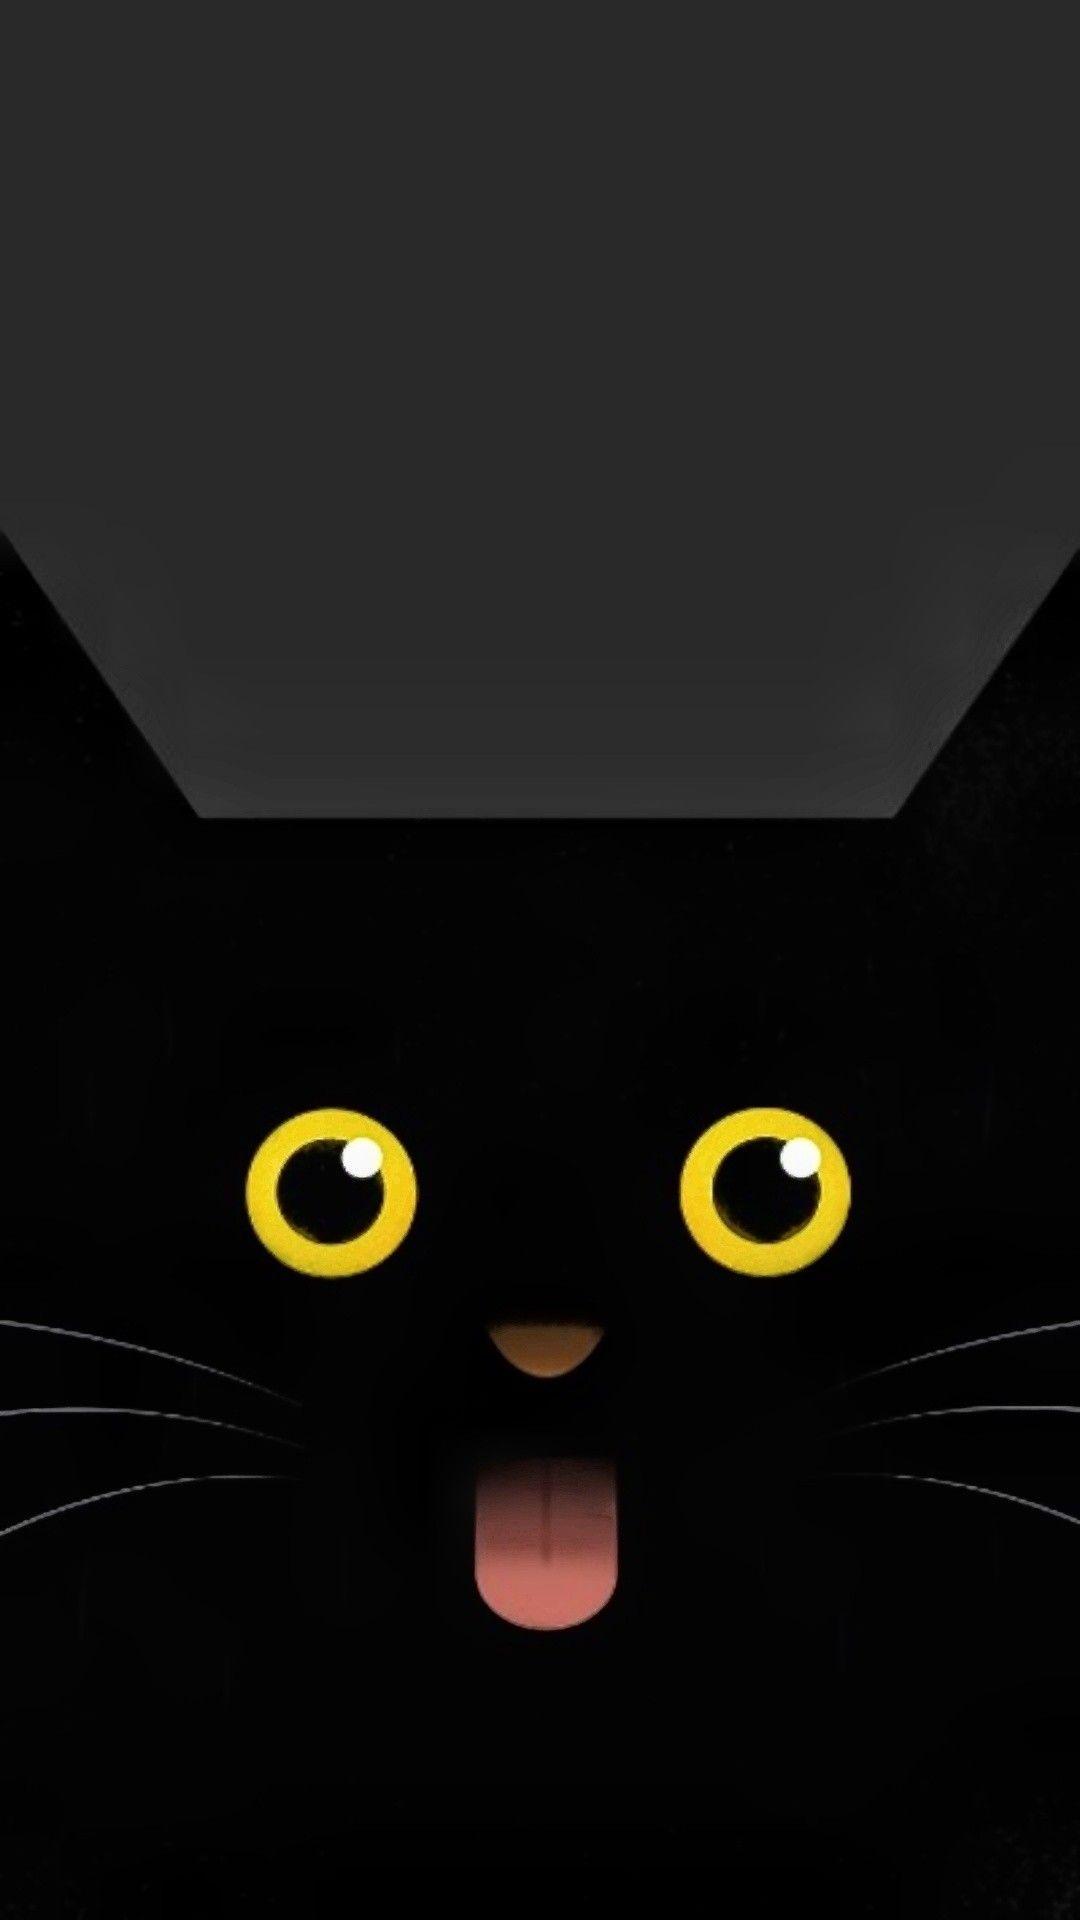 Black Cat Eyes Iphone Wallpaper Cat Phone Wallpaper Cat Wallpaper Android Wallpaper Black